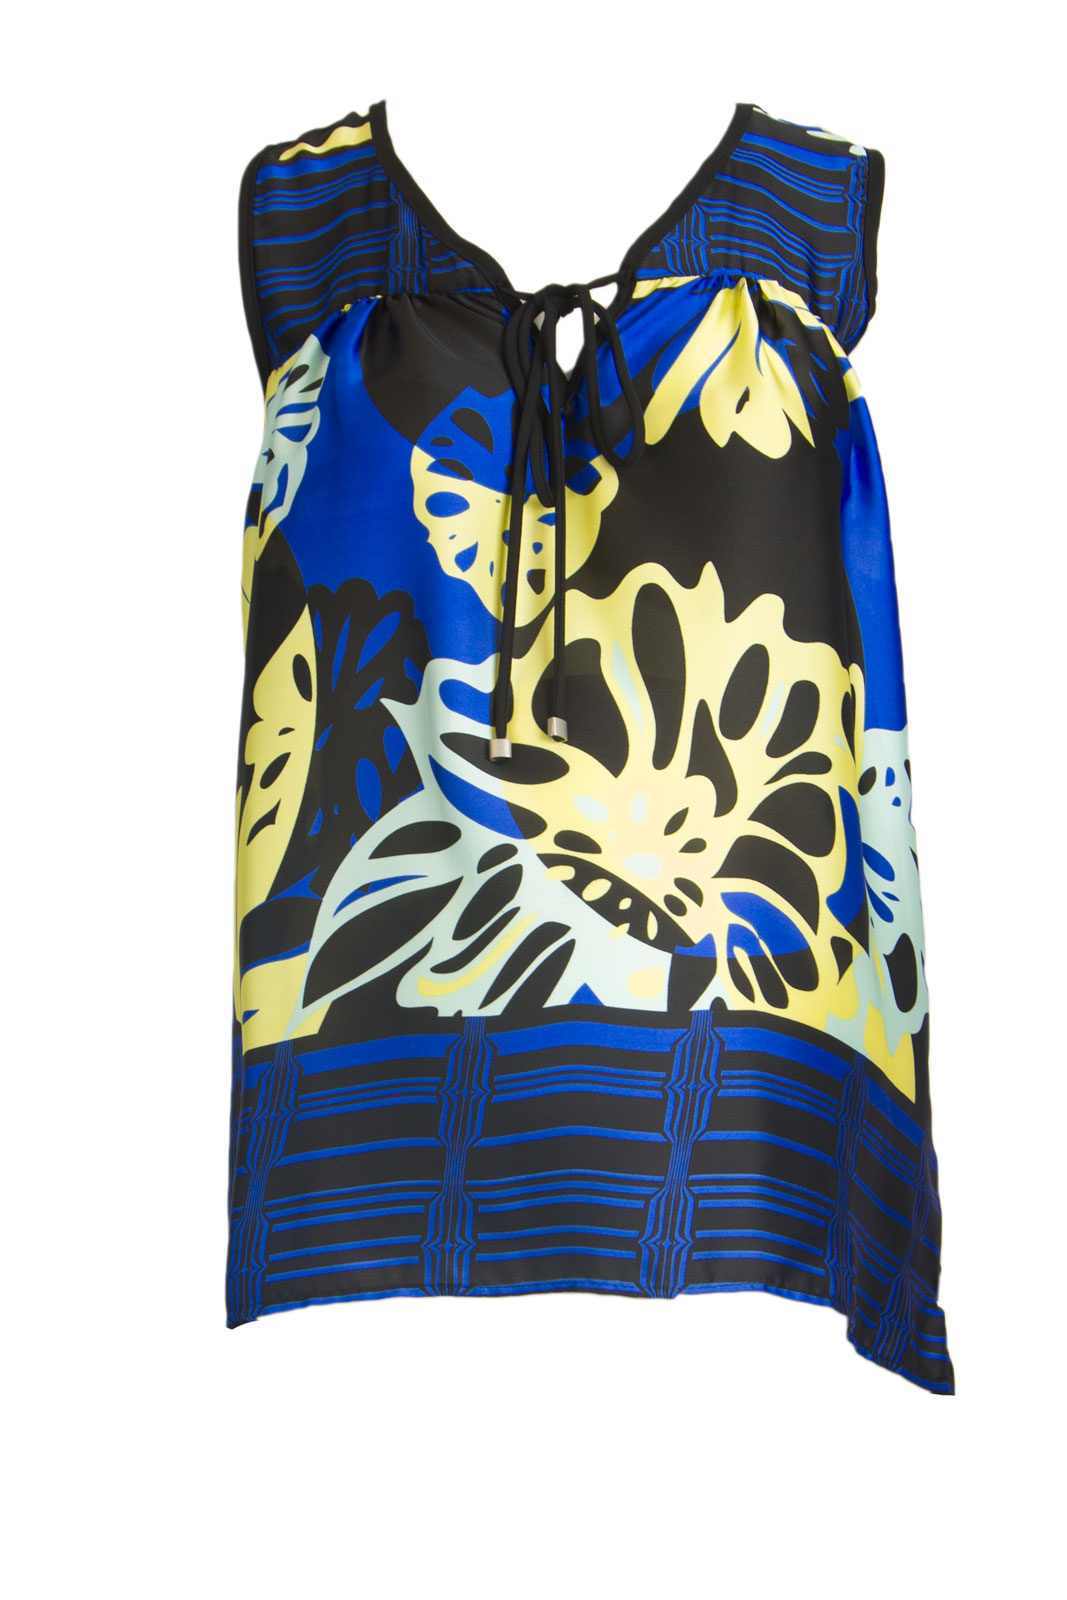 OLIAN Maternity Women's Floral Print Hi-Low Hem Sleeveless Top X-Small Multi